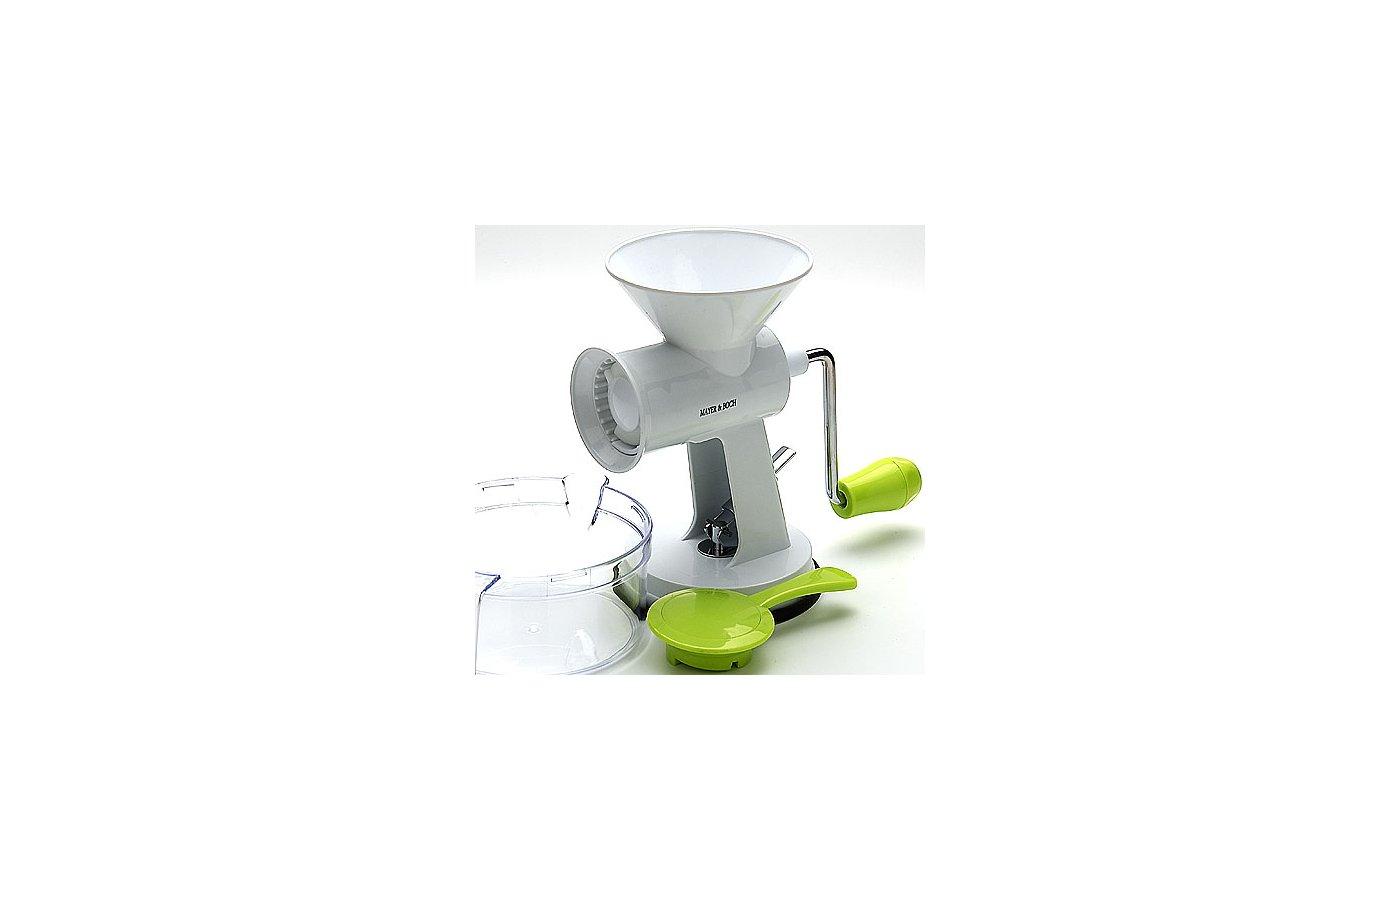 Кухонные инструменты Mayer Boch MB 23305 мясорубка